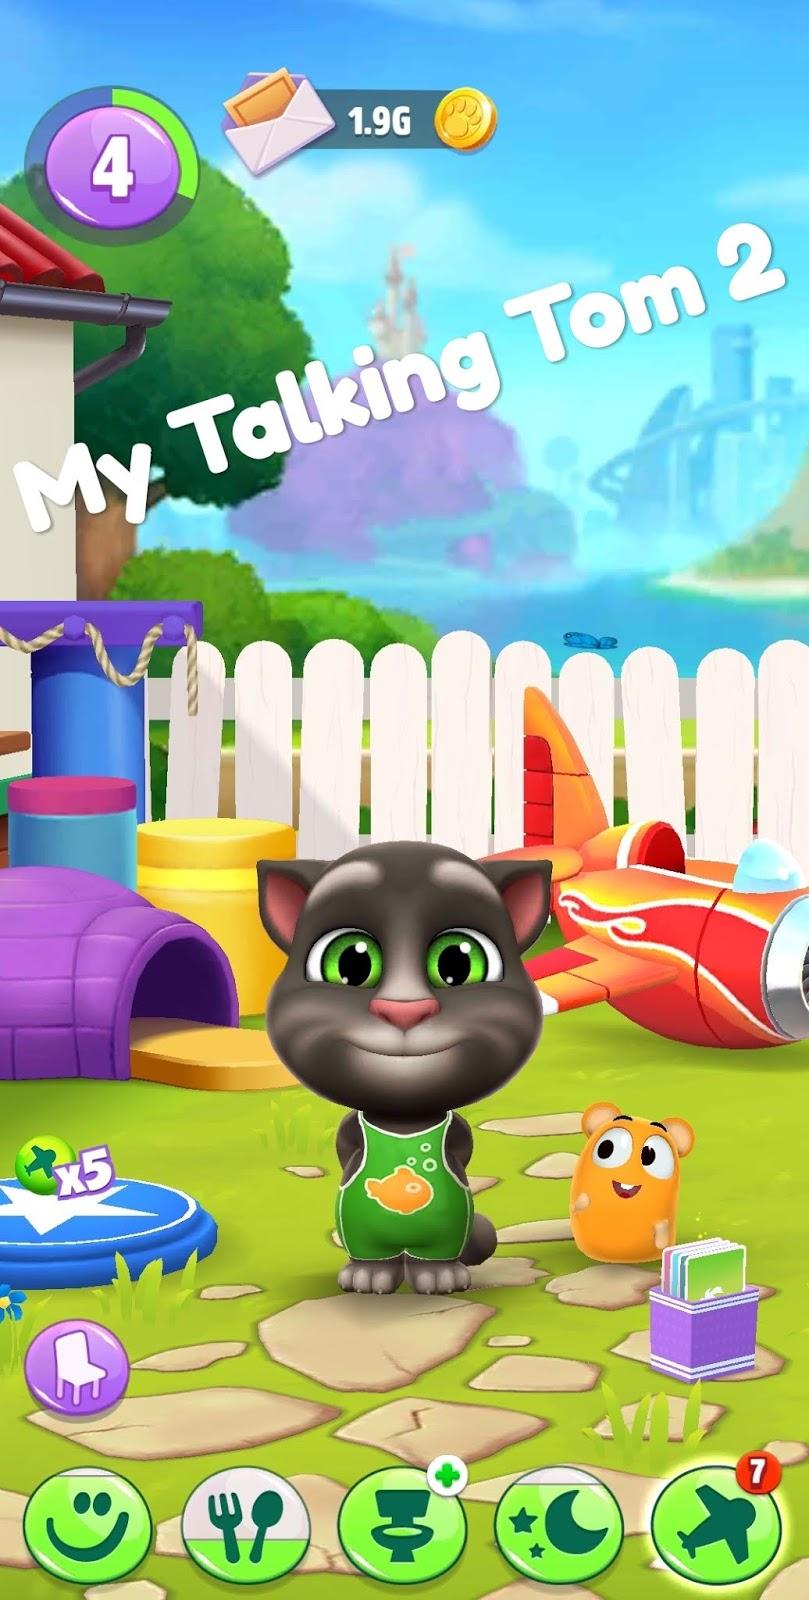 My Talking Tom 2 Mod Apk Version 1 3 4 443 Unlimited Money